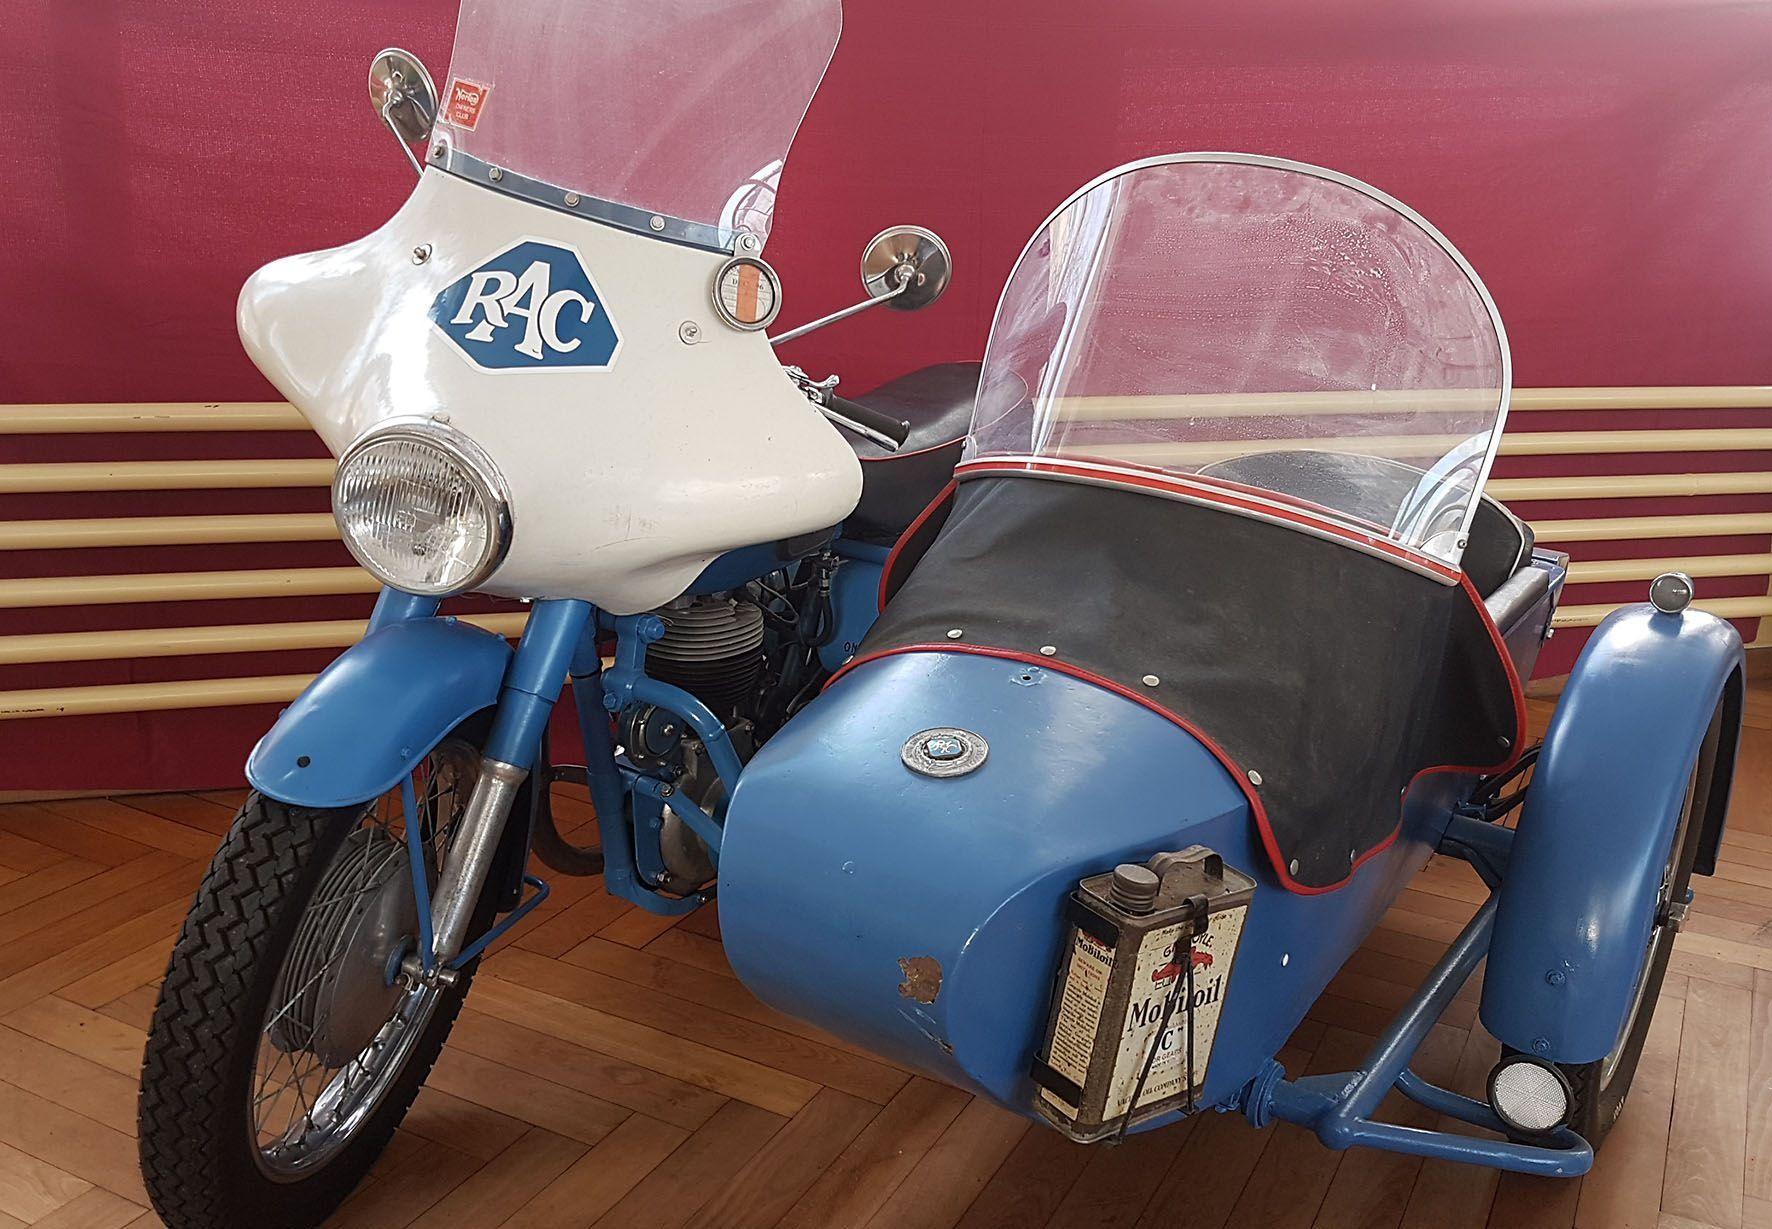 motorrad oldtimer kaufen norton es 2 seitenwagen motorrad. Black Bedroom Furniture Sets. Home Design Ideas